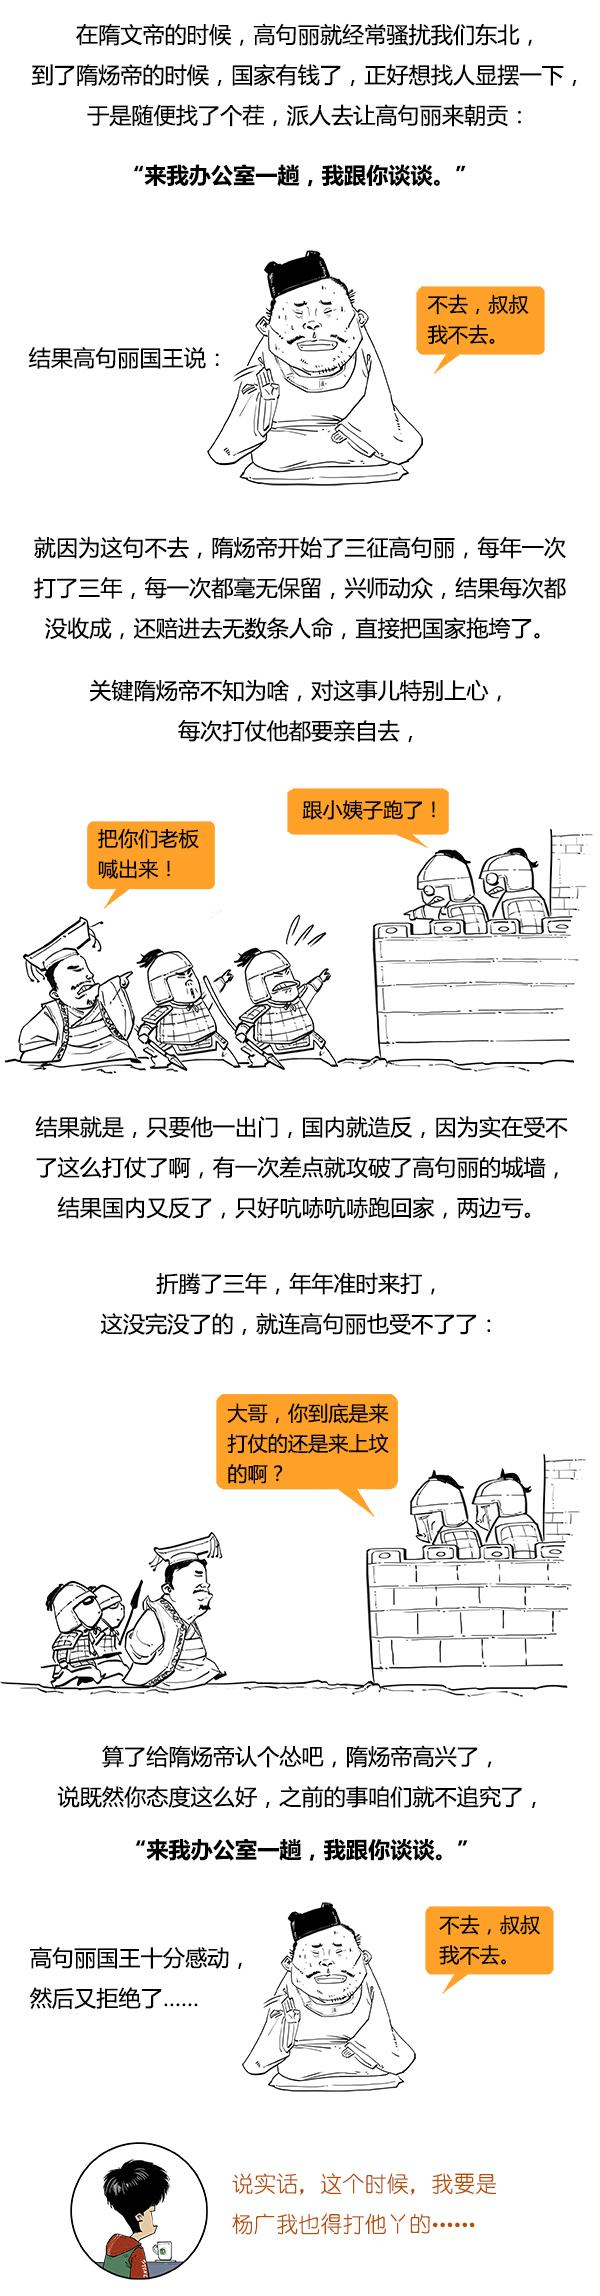 Stone历史剧-隋_06.png